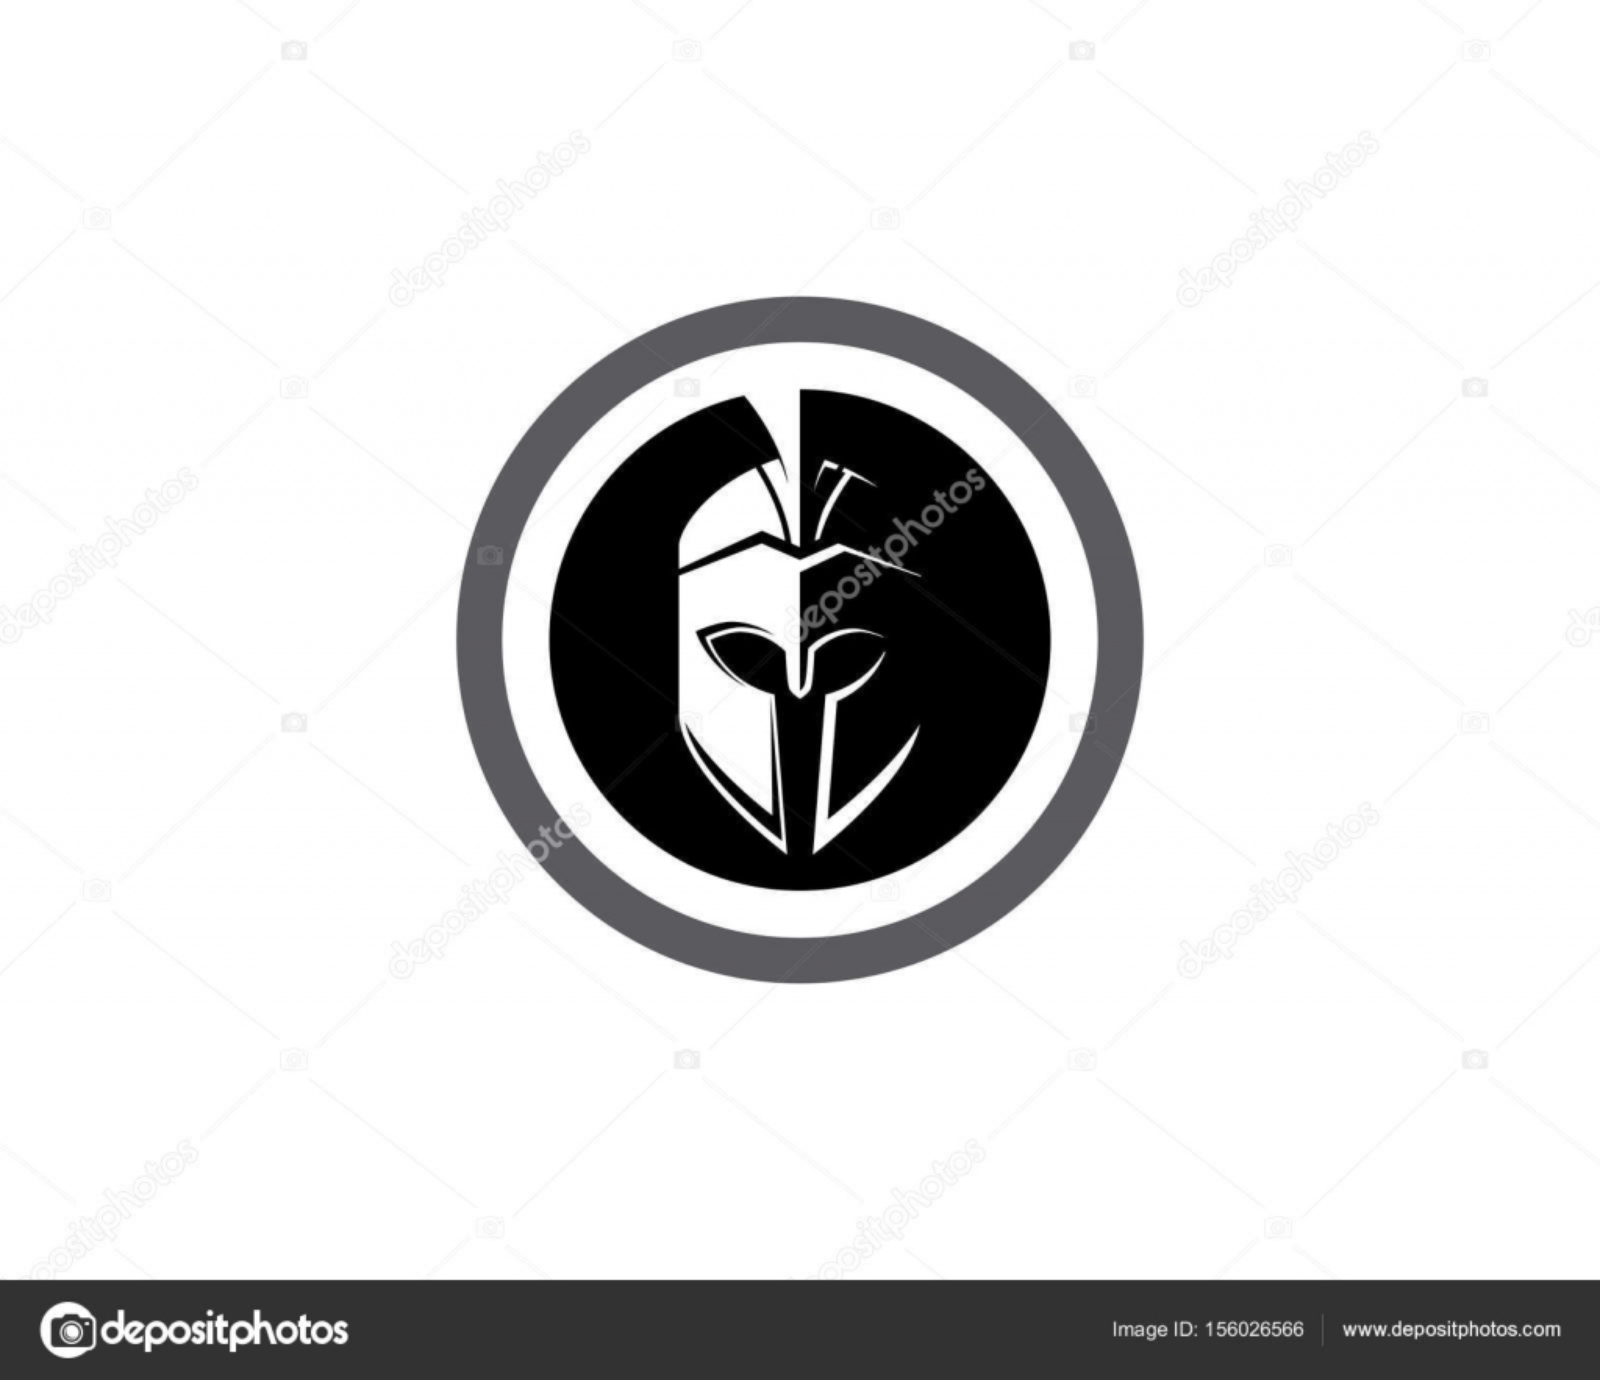 Spartan helmet logo template vector icon stock vector elaelo spartan helmet logo template vector icon stock vector 156026566 pronofoot35fo Choice Image